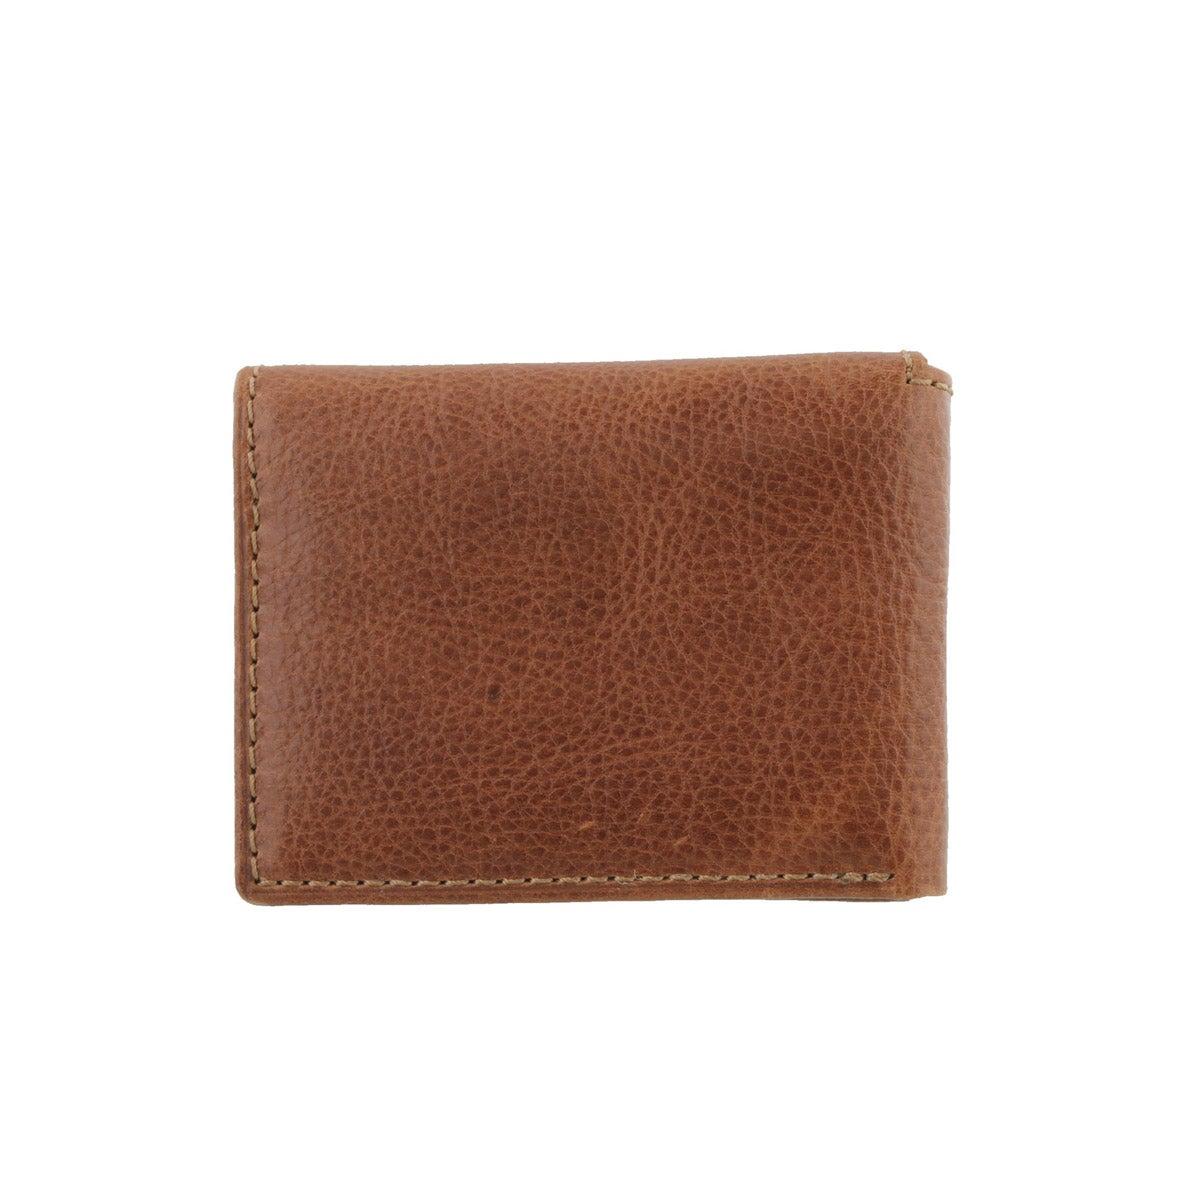 Mns Bradley Execufold tan leather wallet